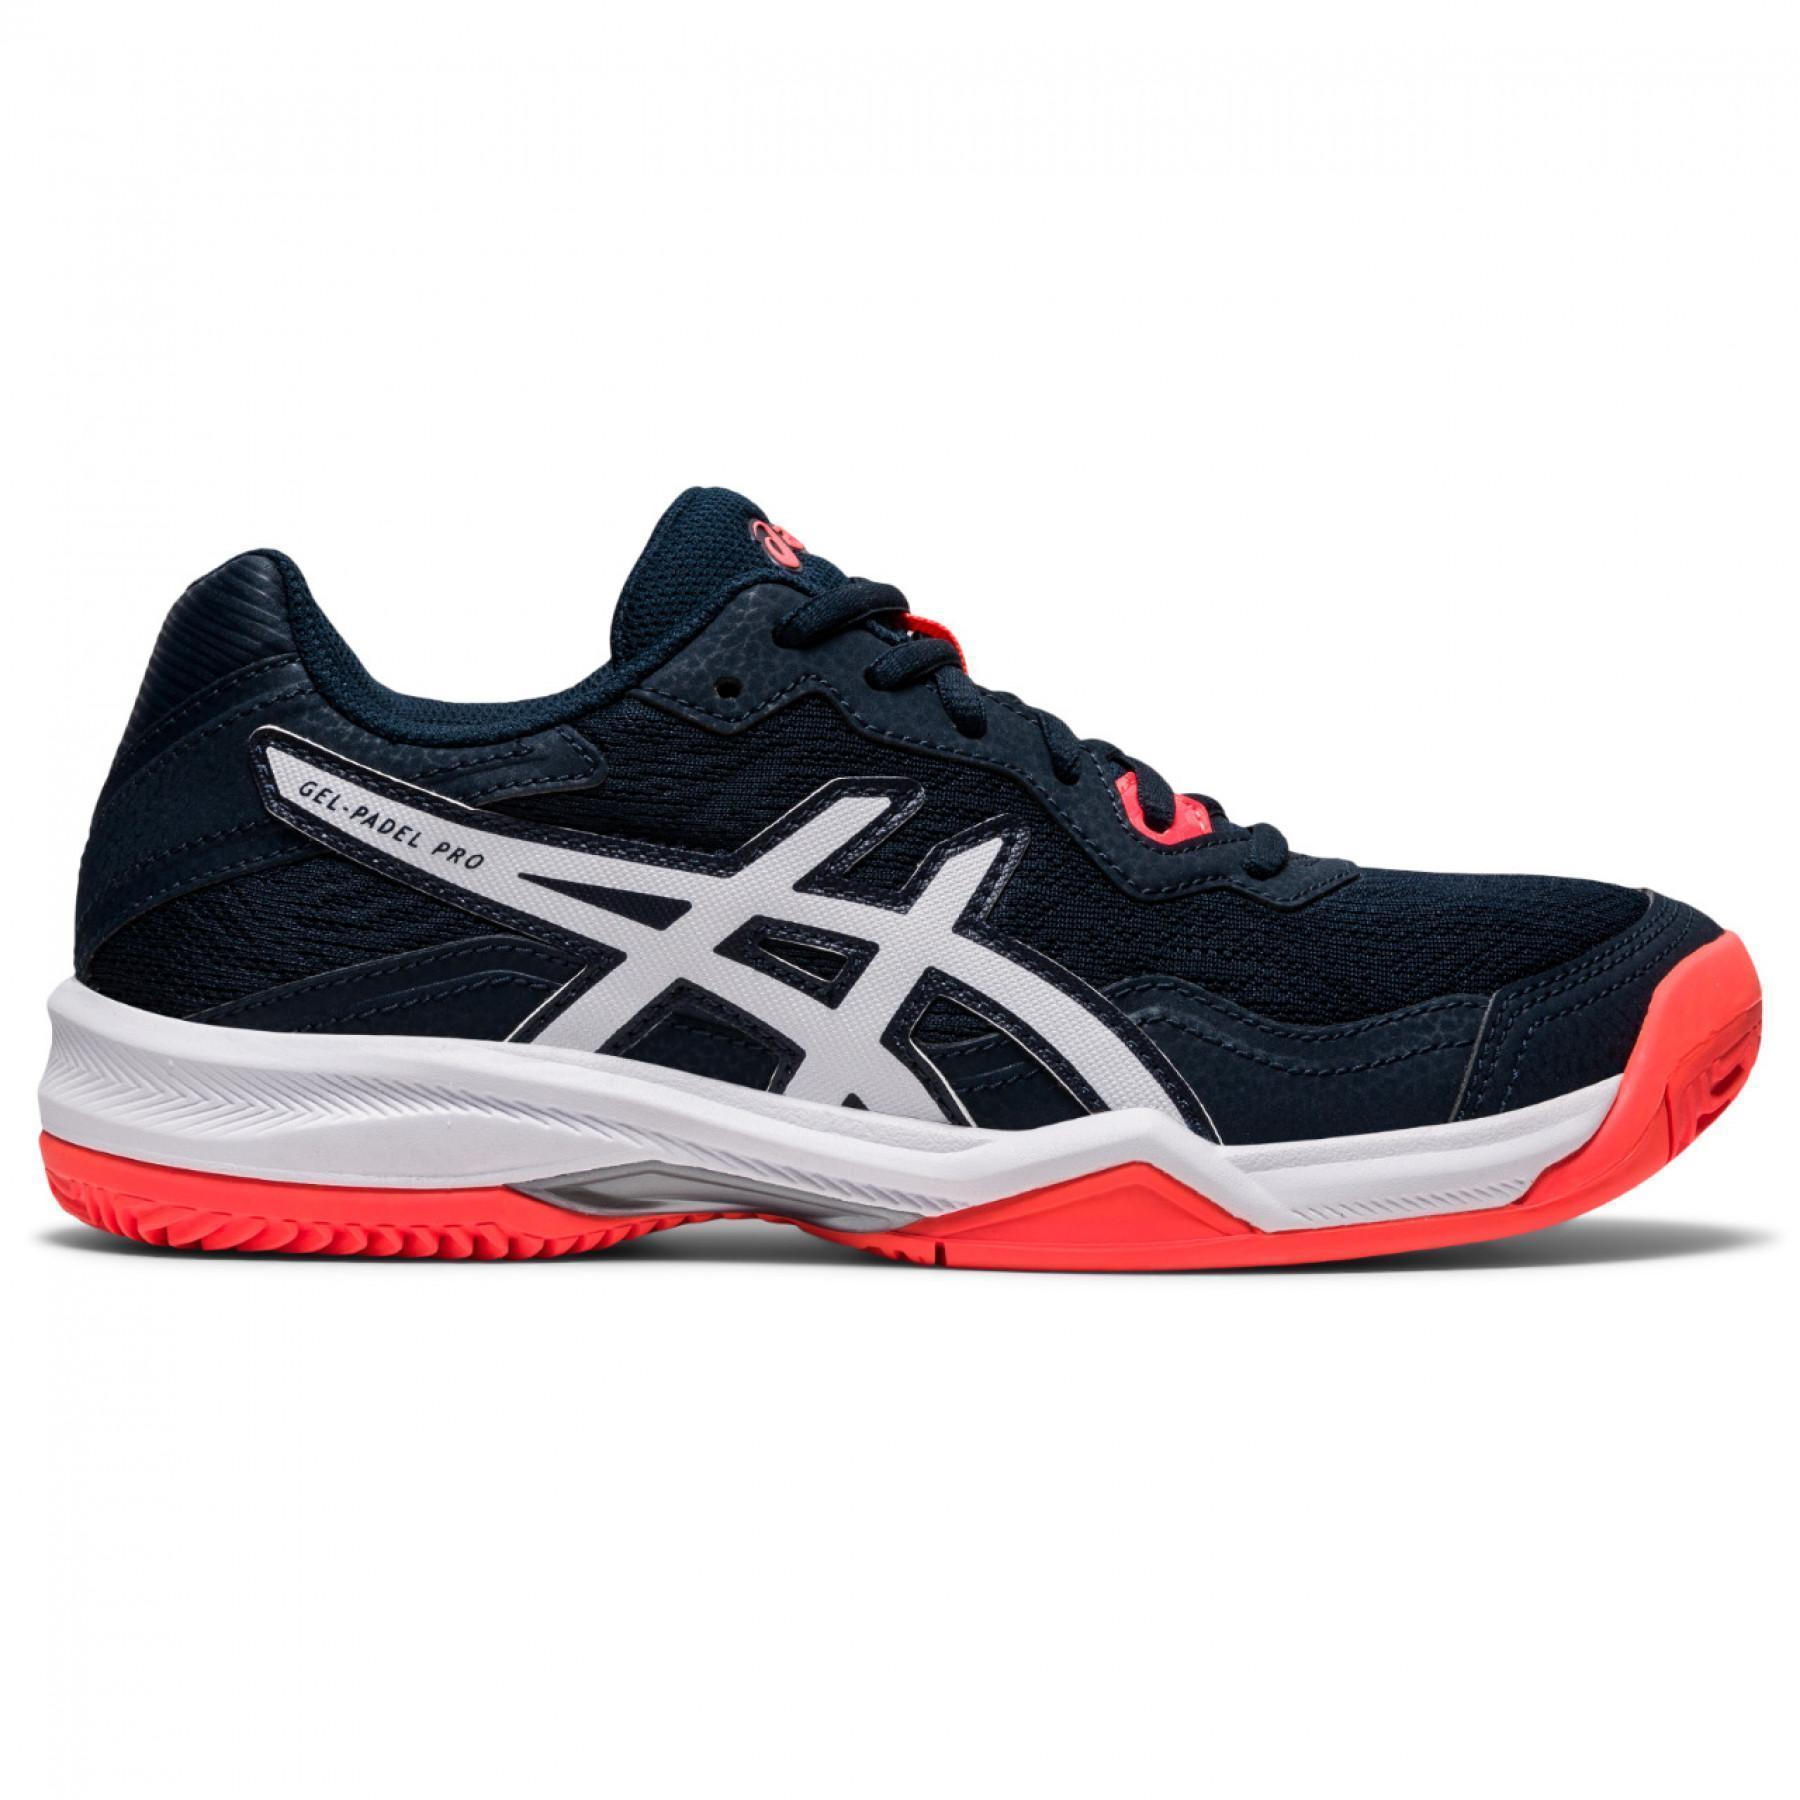 Women's shoes Asics Gel-Padel Pro 4